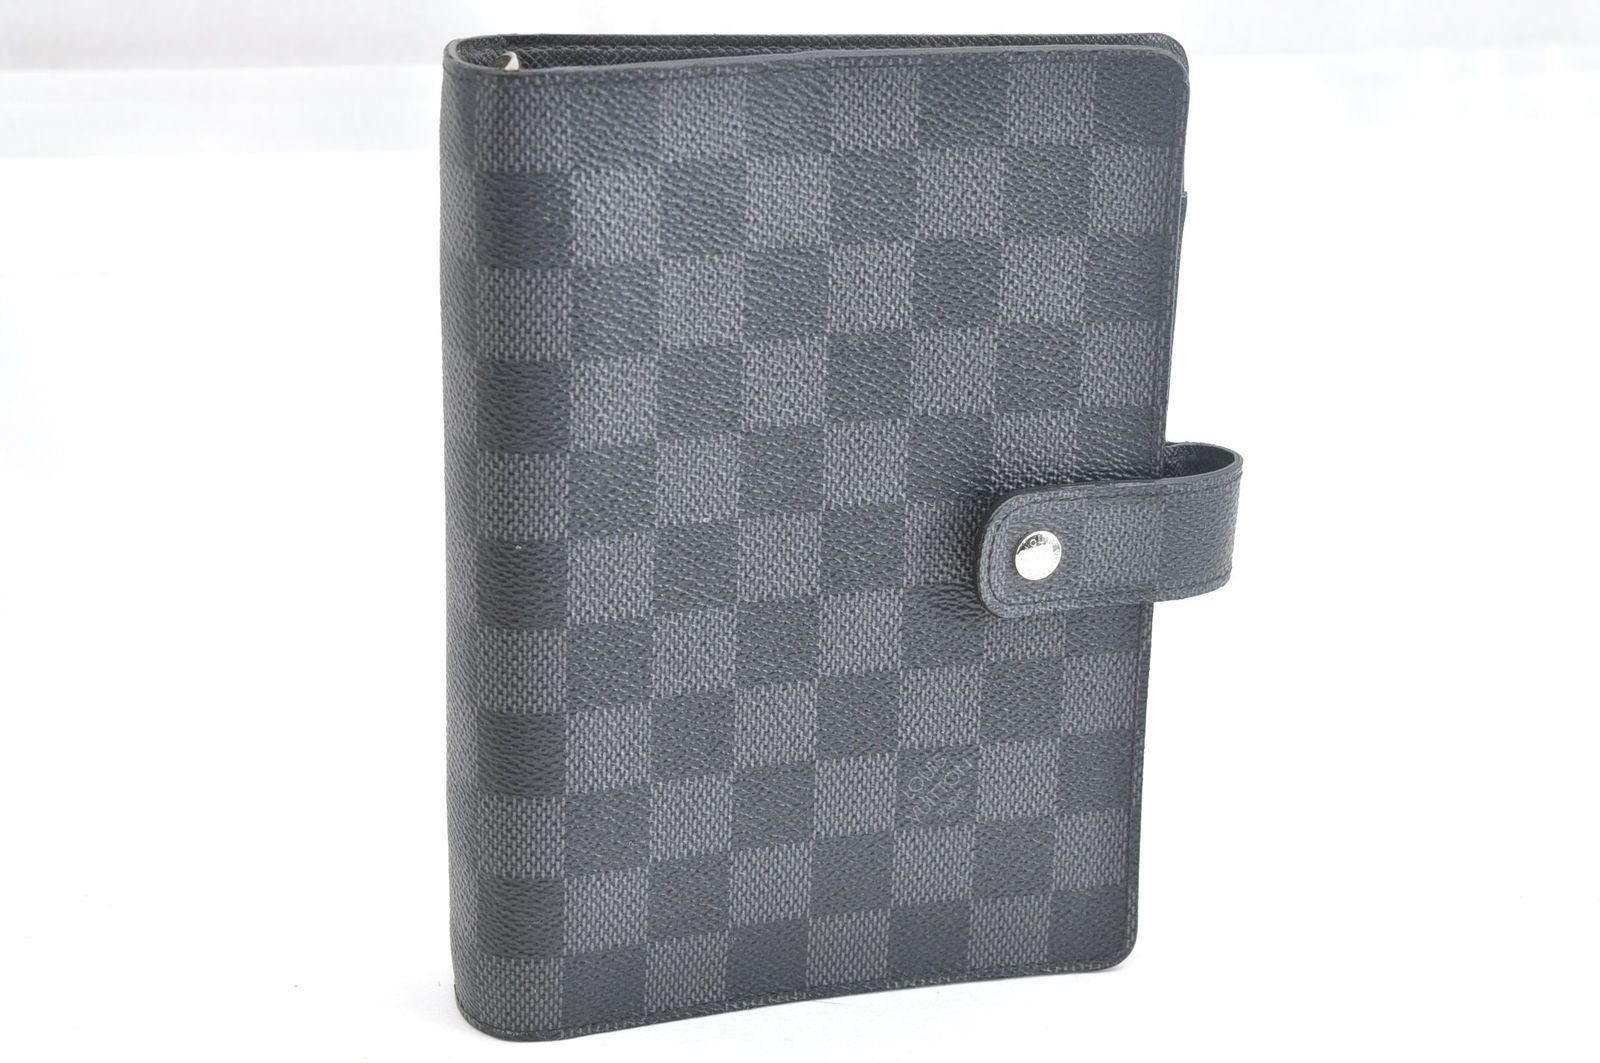 1c264f449d93 Auth Louis Vuitton Agenda Mm Notebook Cover Damier Graphite R20242 ...